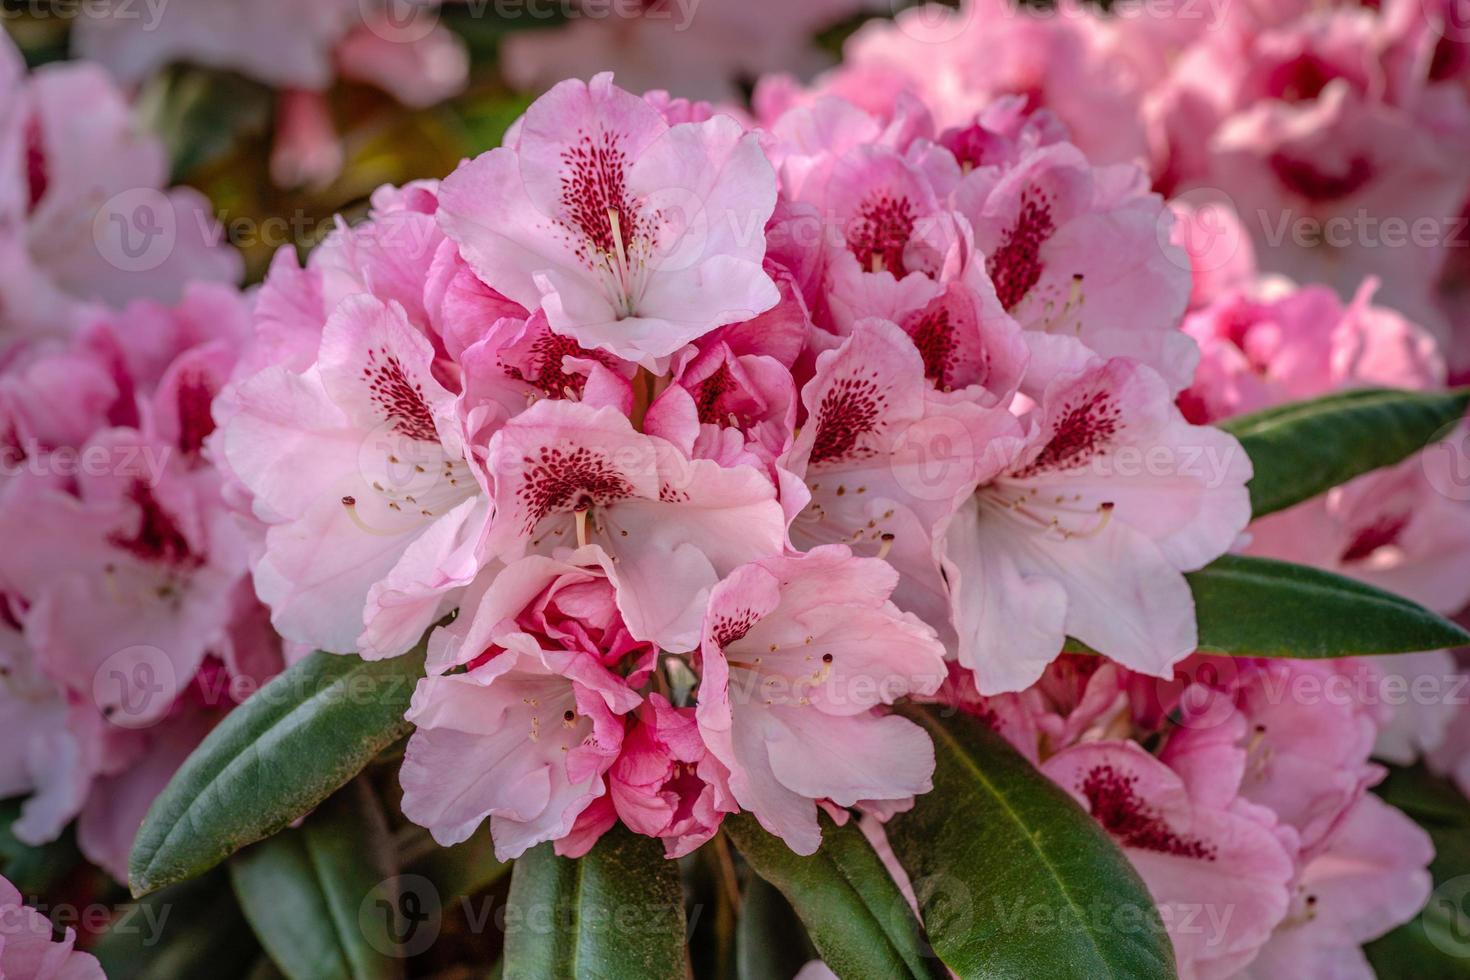 flores de rododendro rosa claro foto